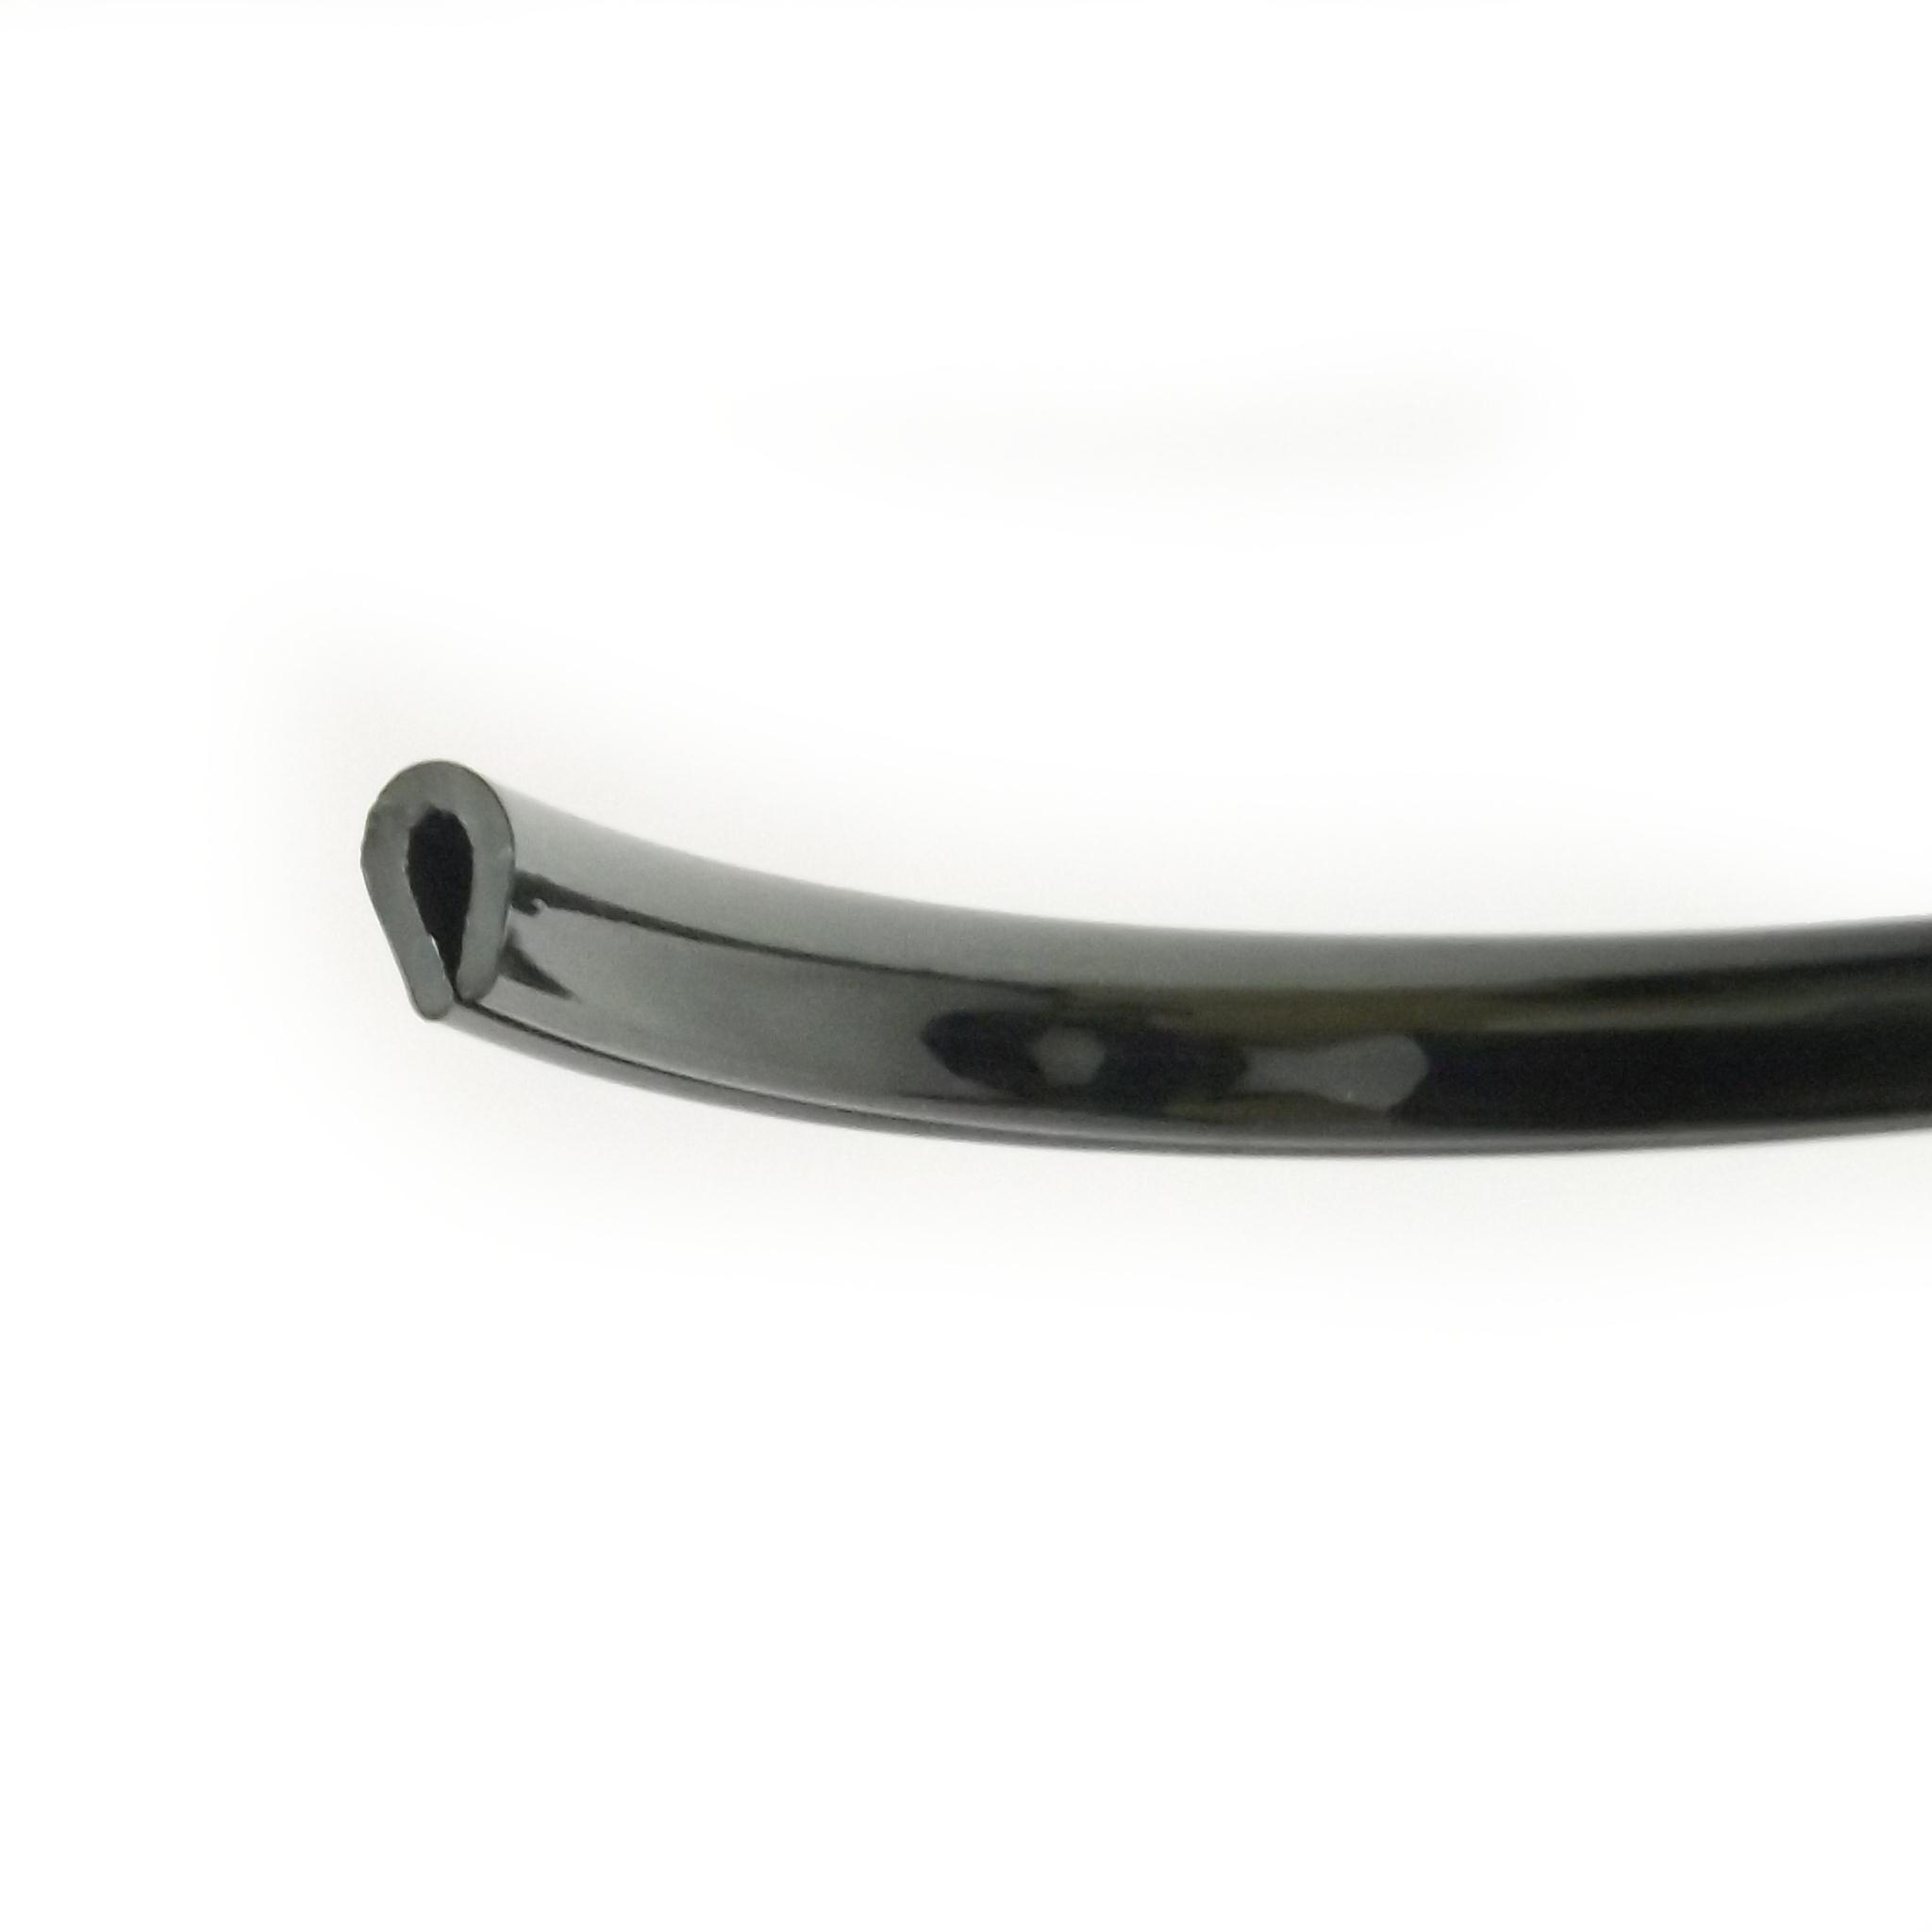 Small Black Protective PVC Edge Trim - Gloss Black